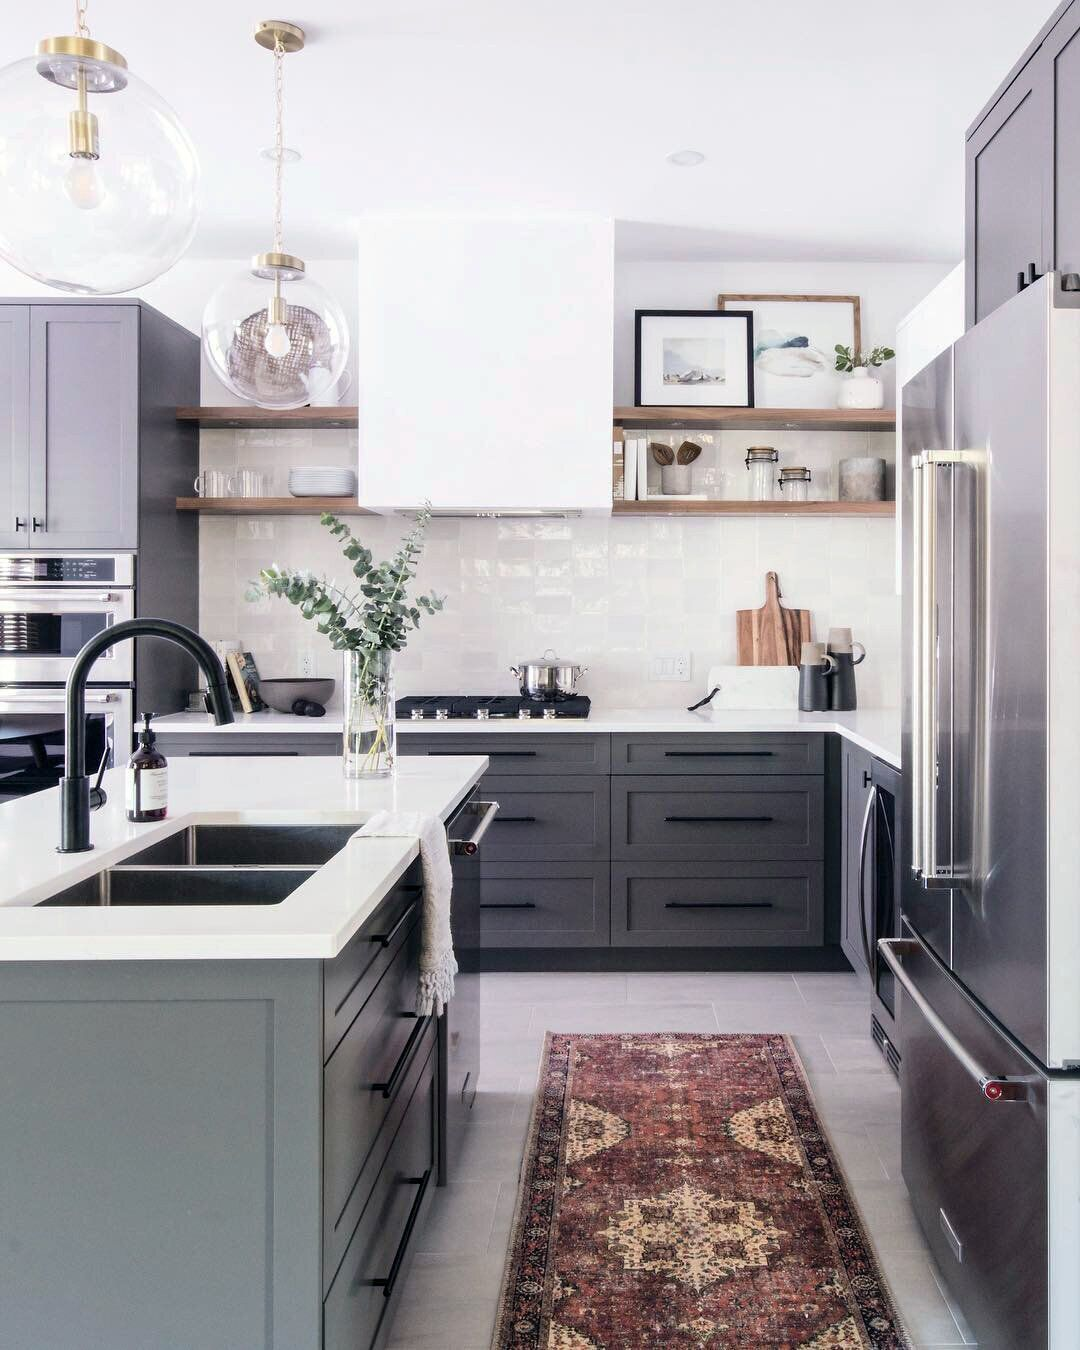 Shop The Look Loren Red Navy Runner Acadia Pizza Board Virginia Vase Grey Kitchen Designs Kitchen Design Interior Design Kitchen